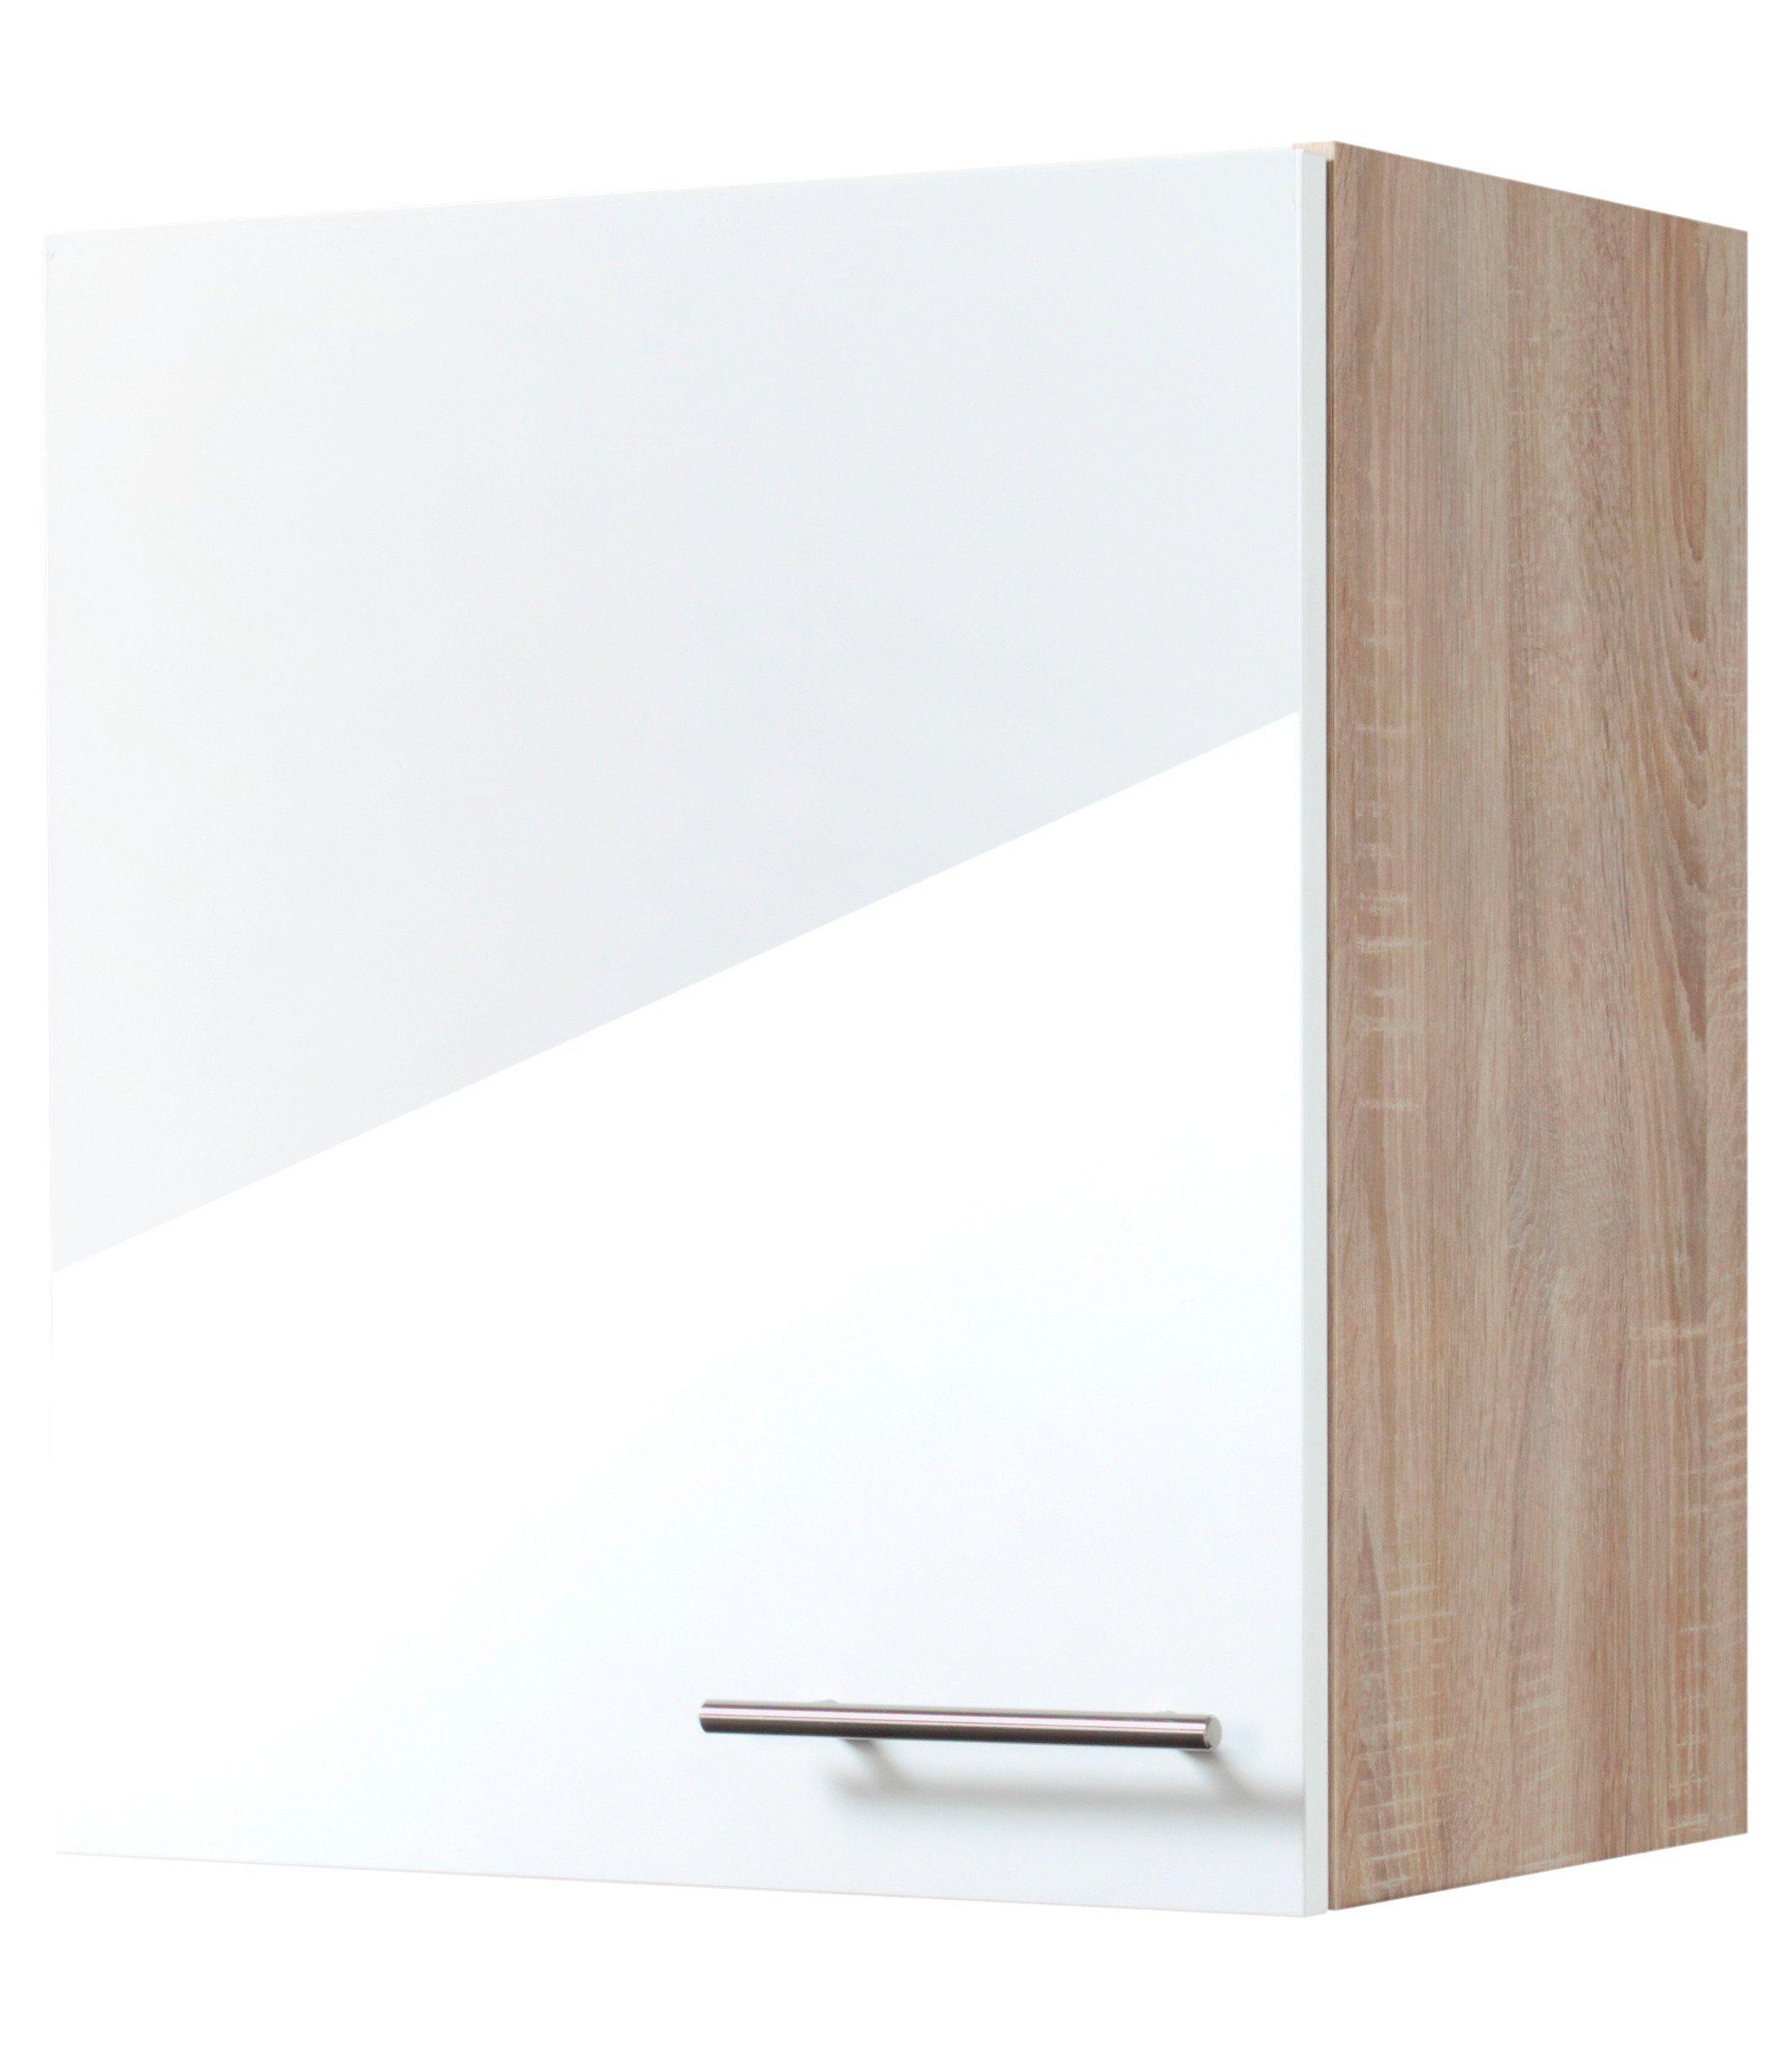 Optifit Küchenhängeschrank »Dakar«, Breite 50 cm